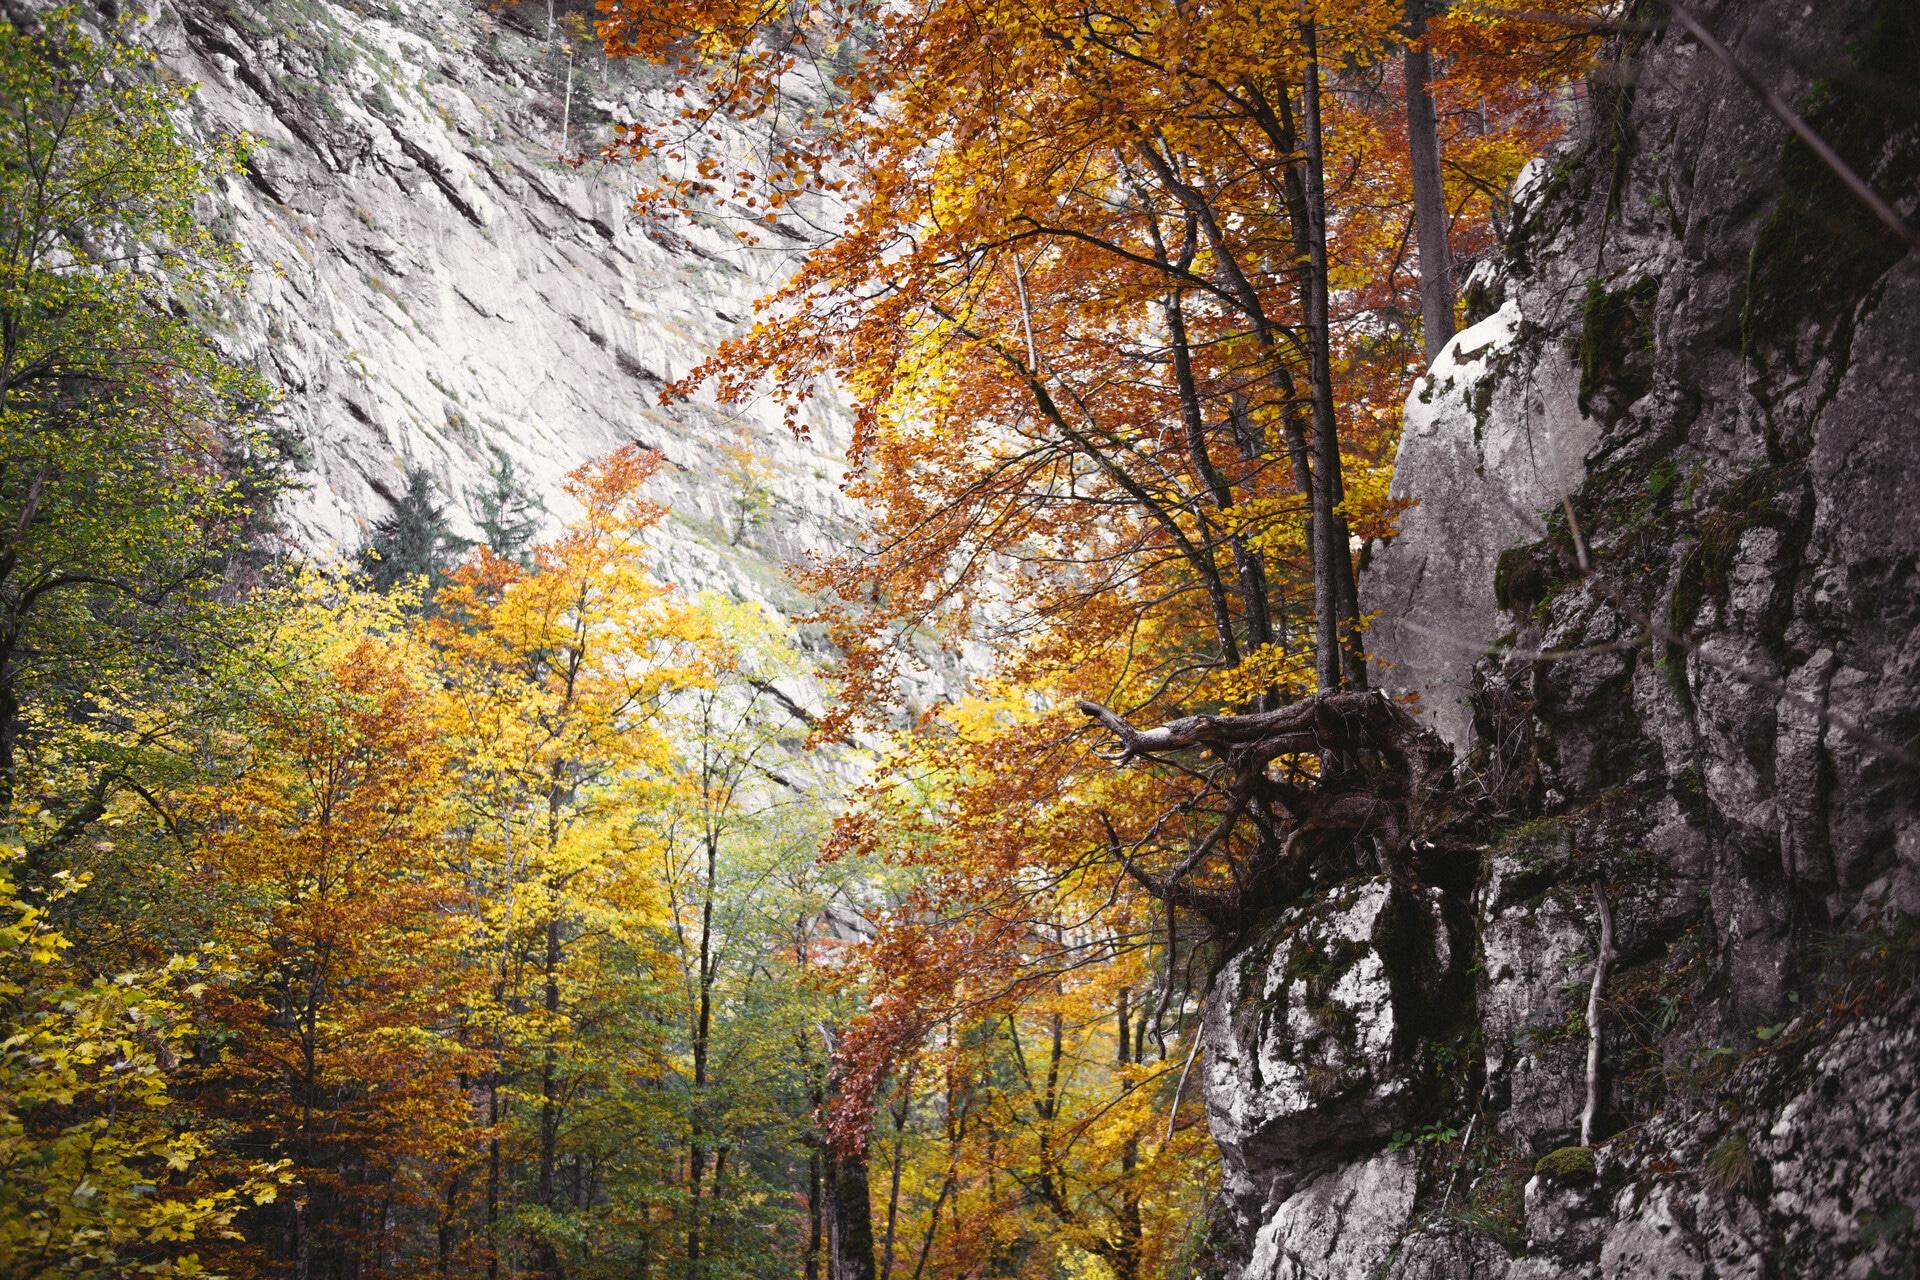 194_Nationalpark_Gesäuse_2019©StefanLeitner